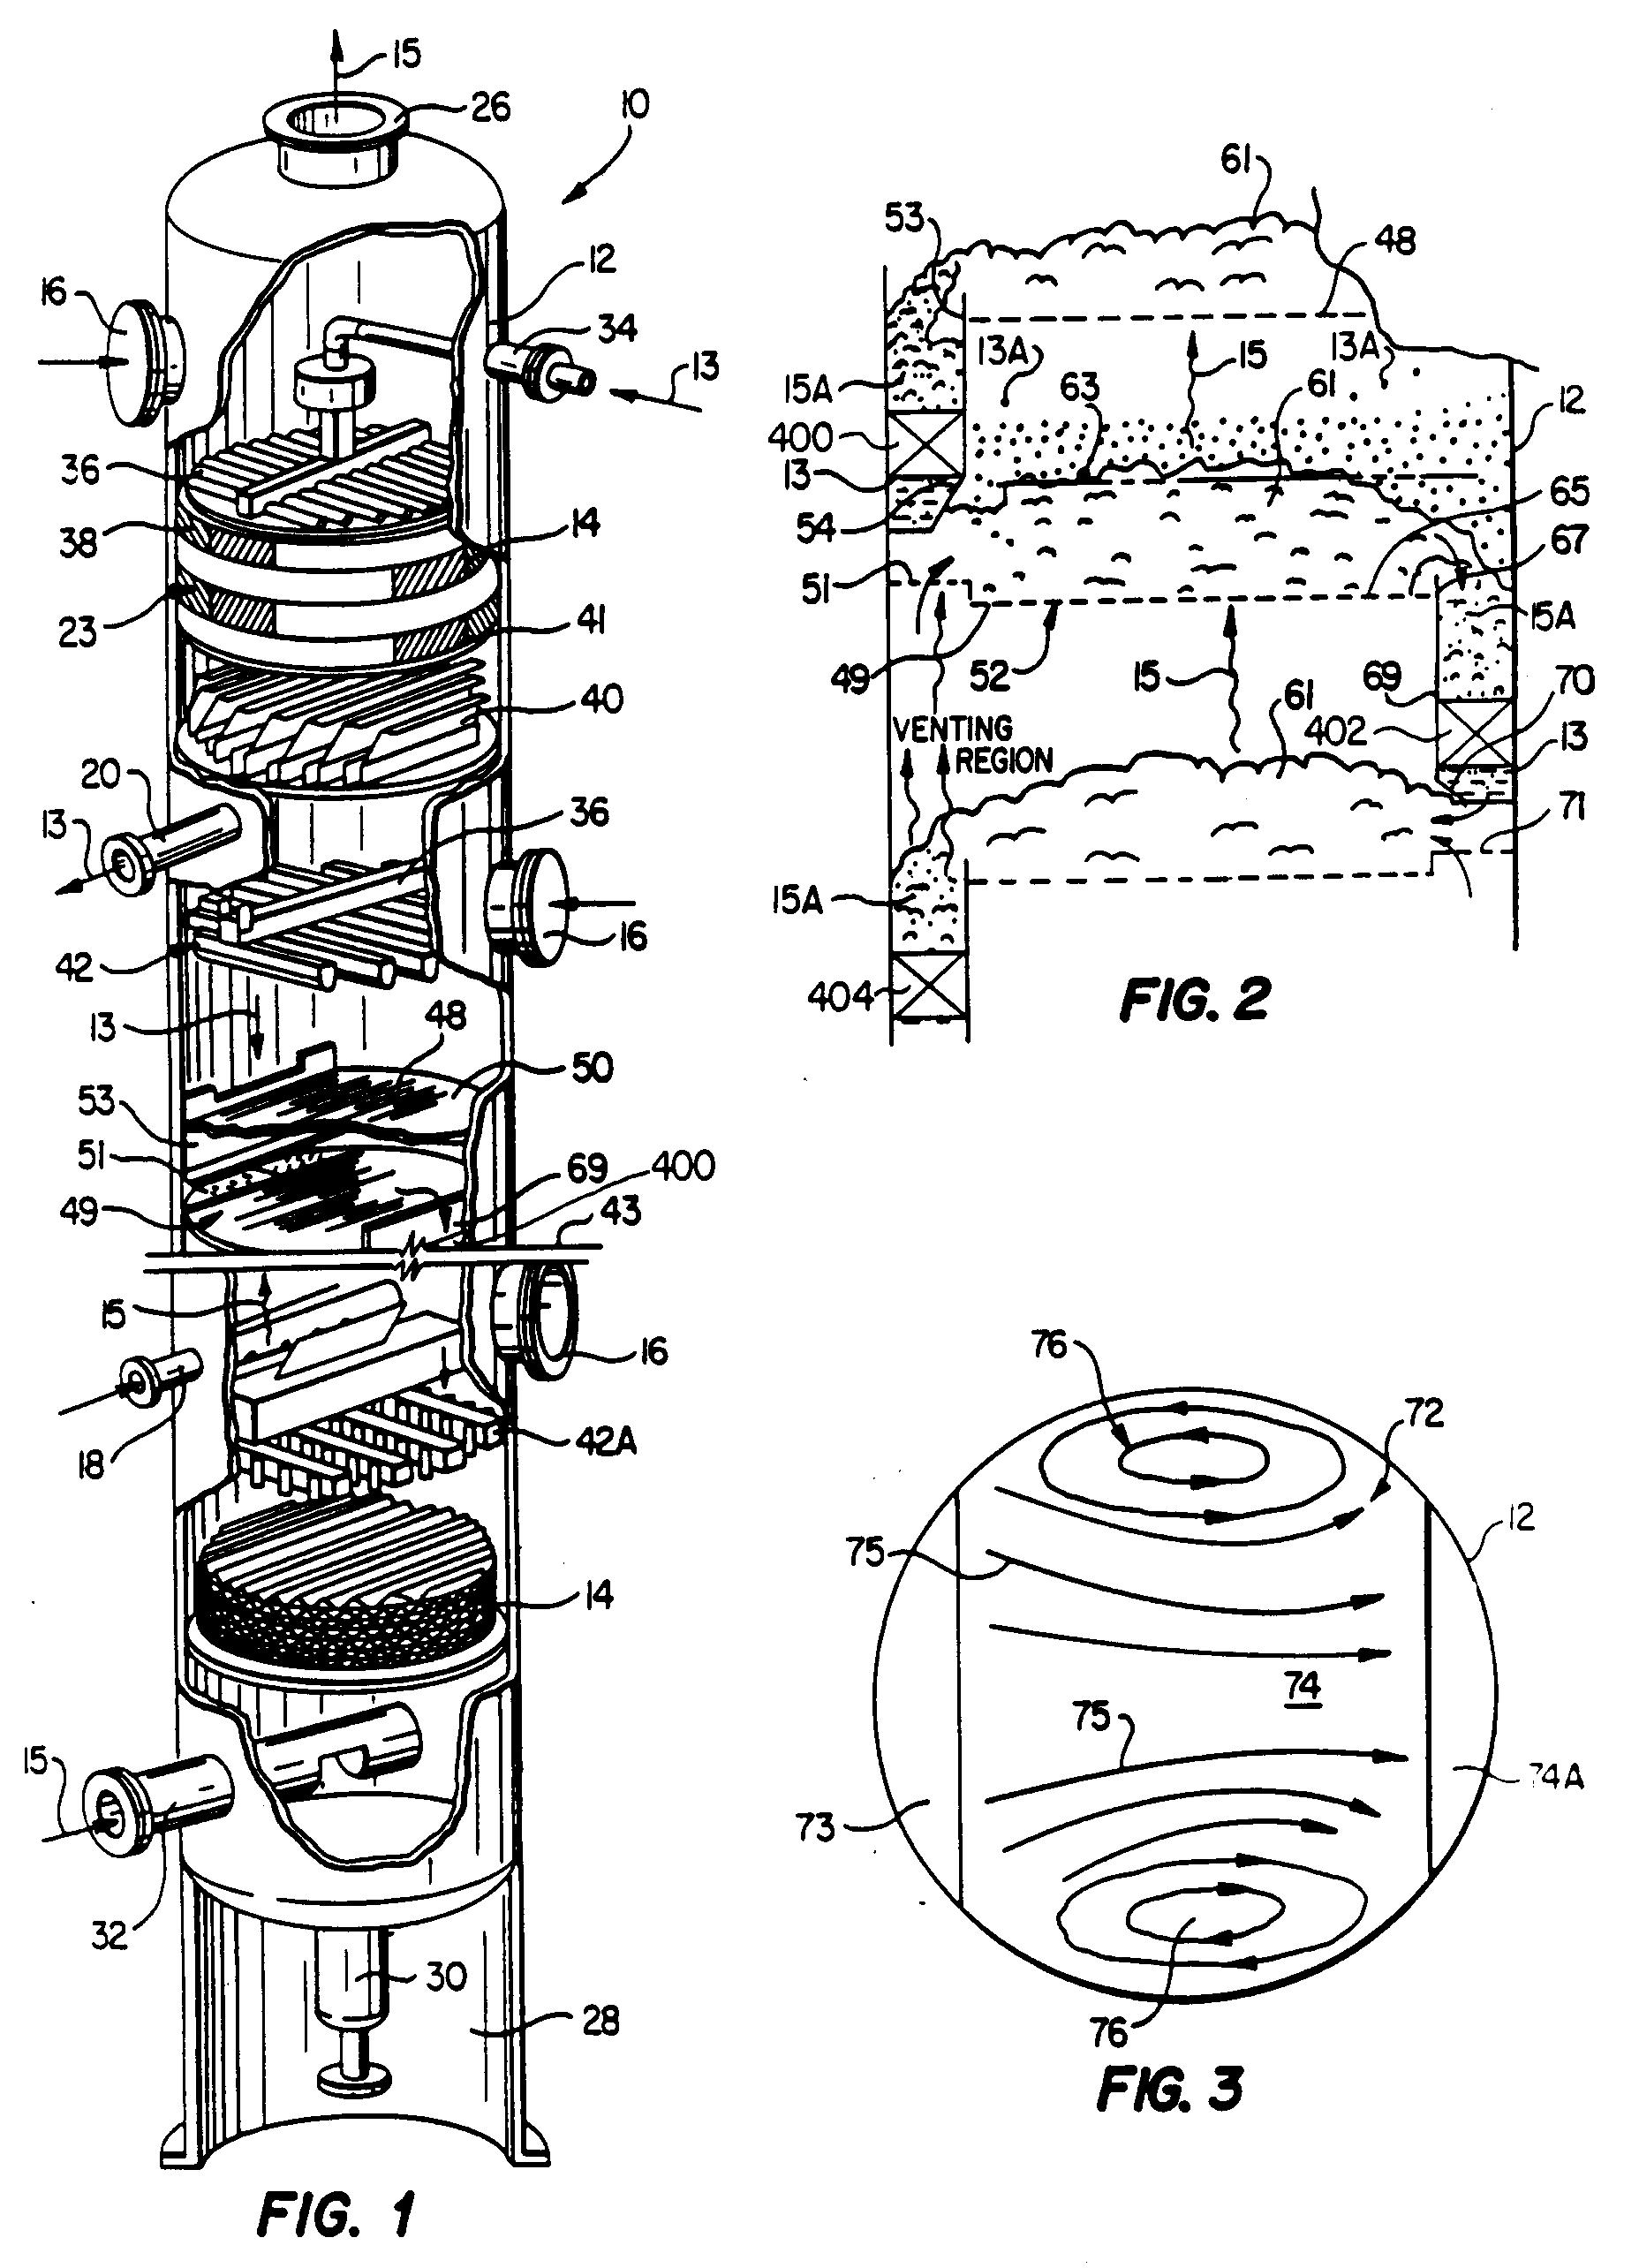 Imgf on Fractional Distillation Column